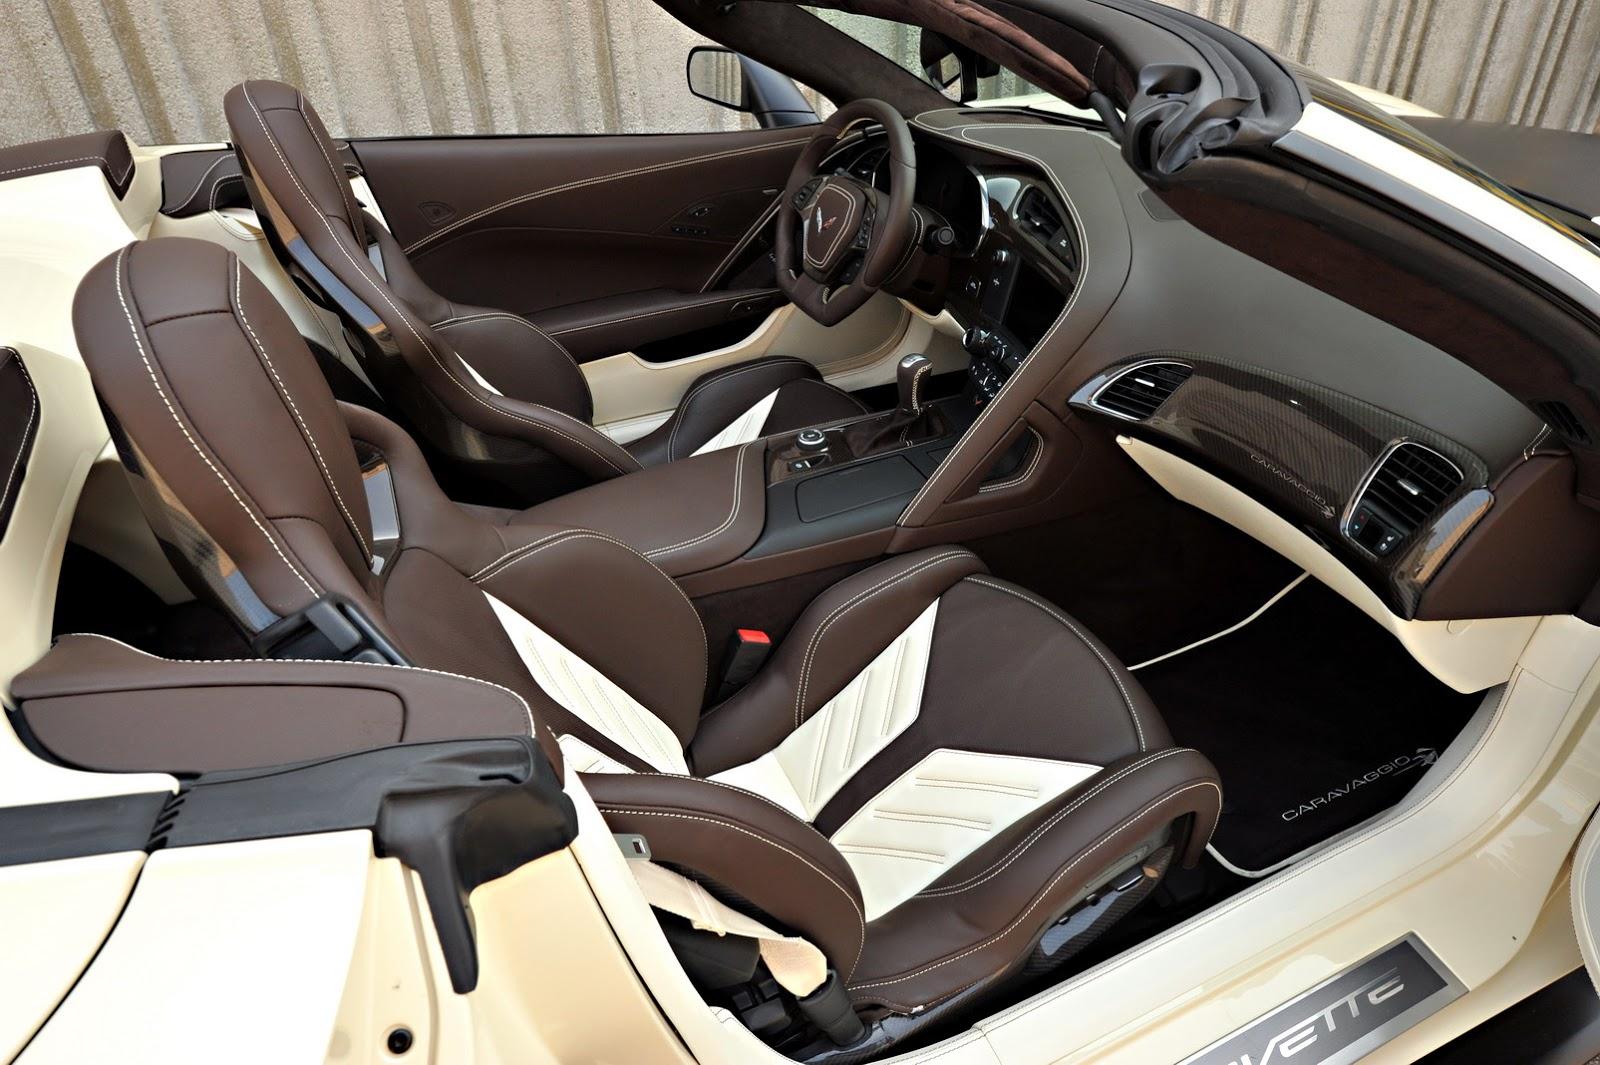 From canada with love caravaggio custom corvette z06 is a 2014 corvette white with red interior